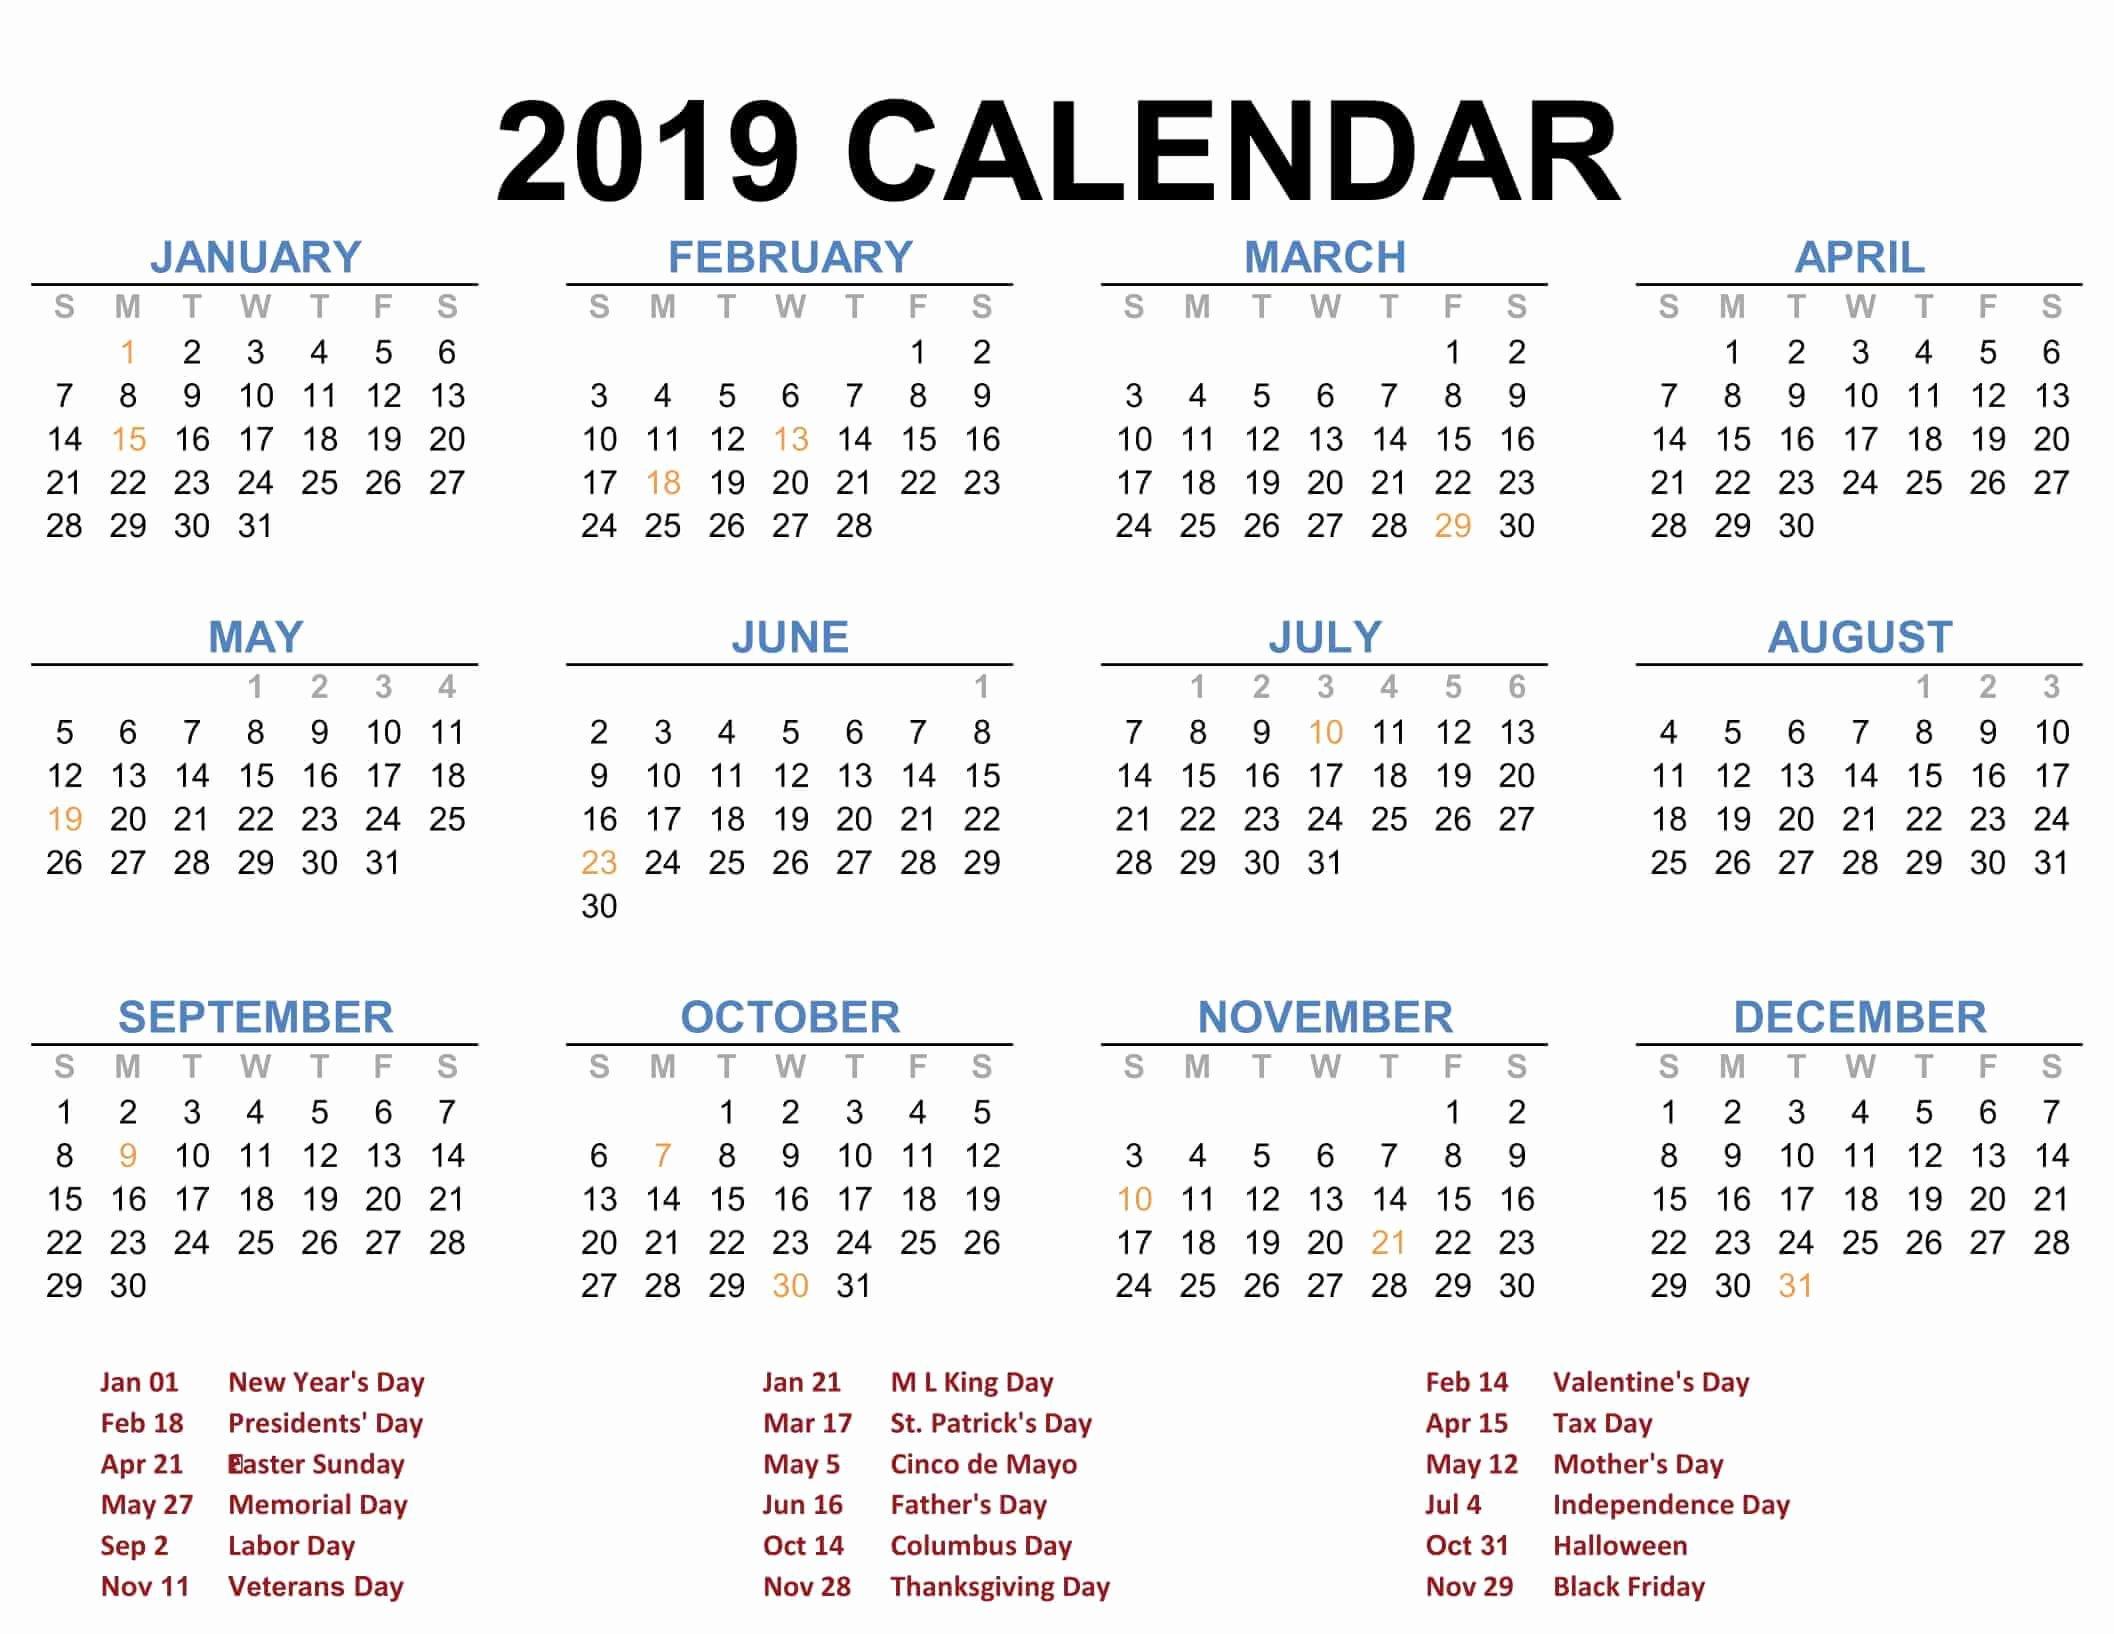 Free 2019 Calendar Template Elegant 2019 Printable Calendar Templates Pdf Excel Word Free